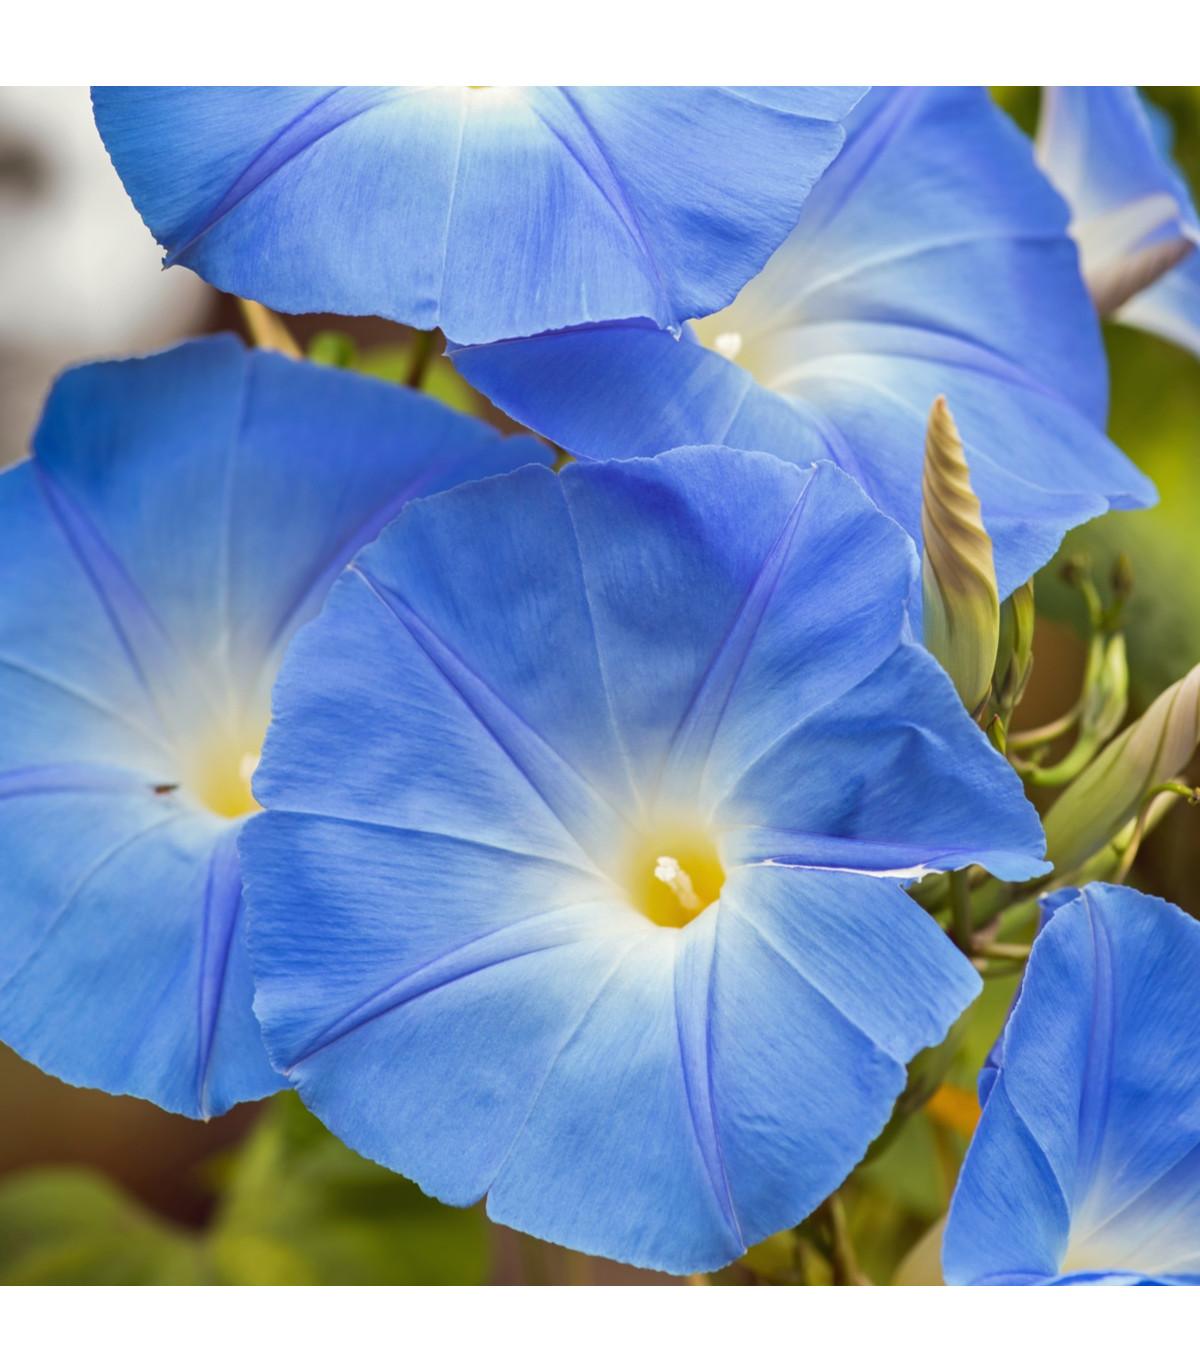 Povíjnice modrá - Ipomoea rubro-coerulea - osivo povíjnice - 25 ks